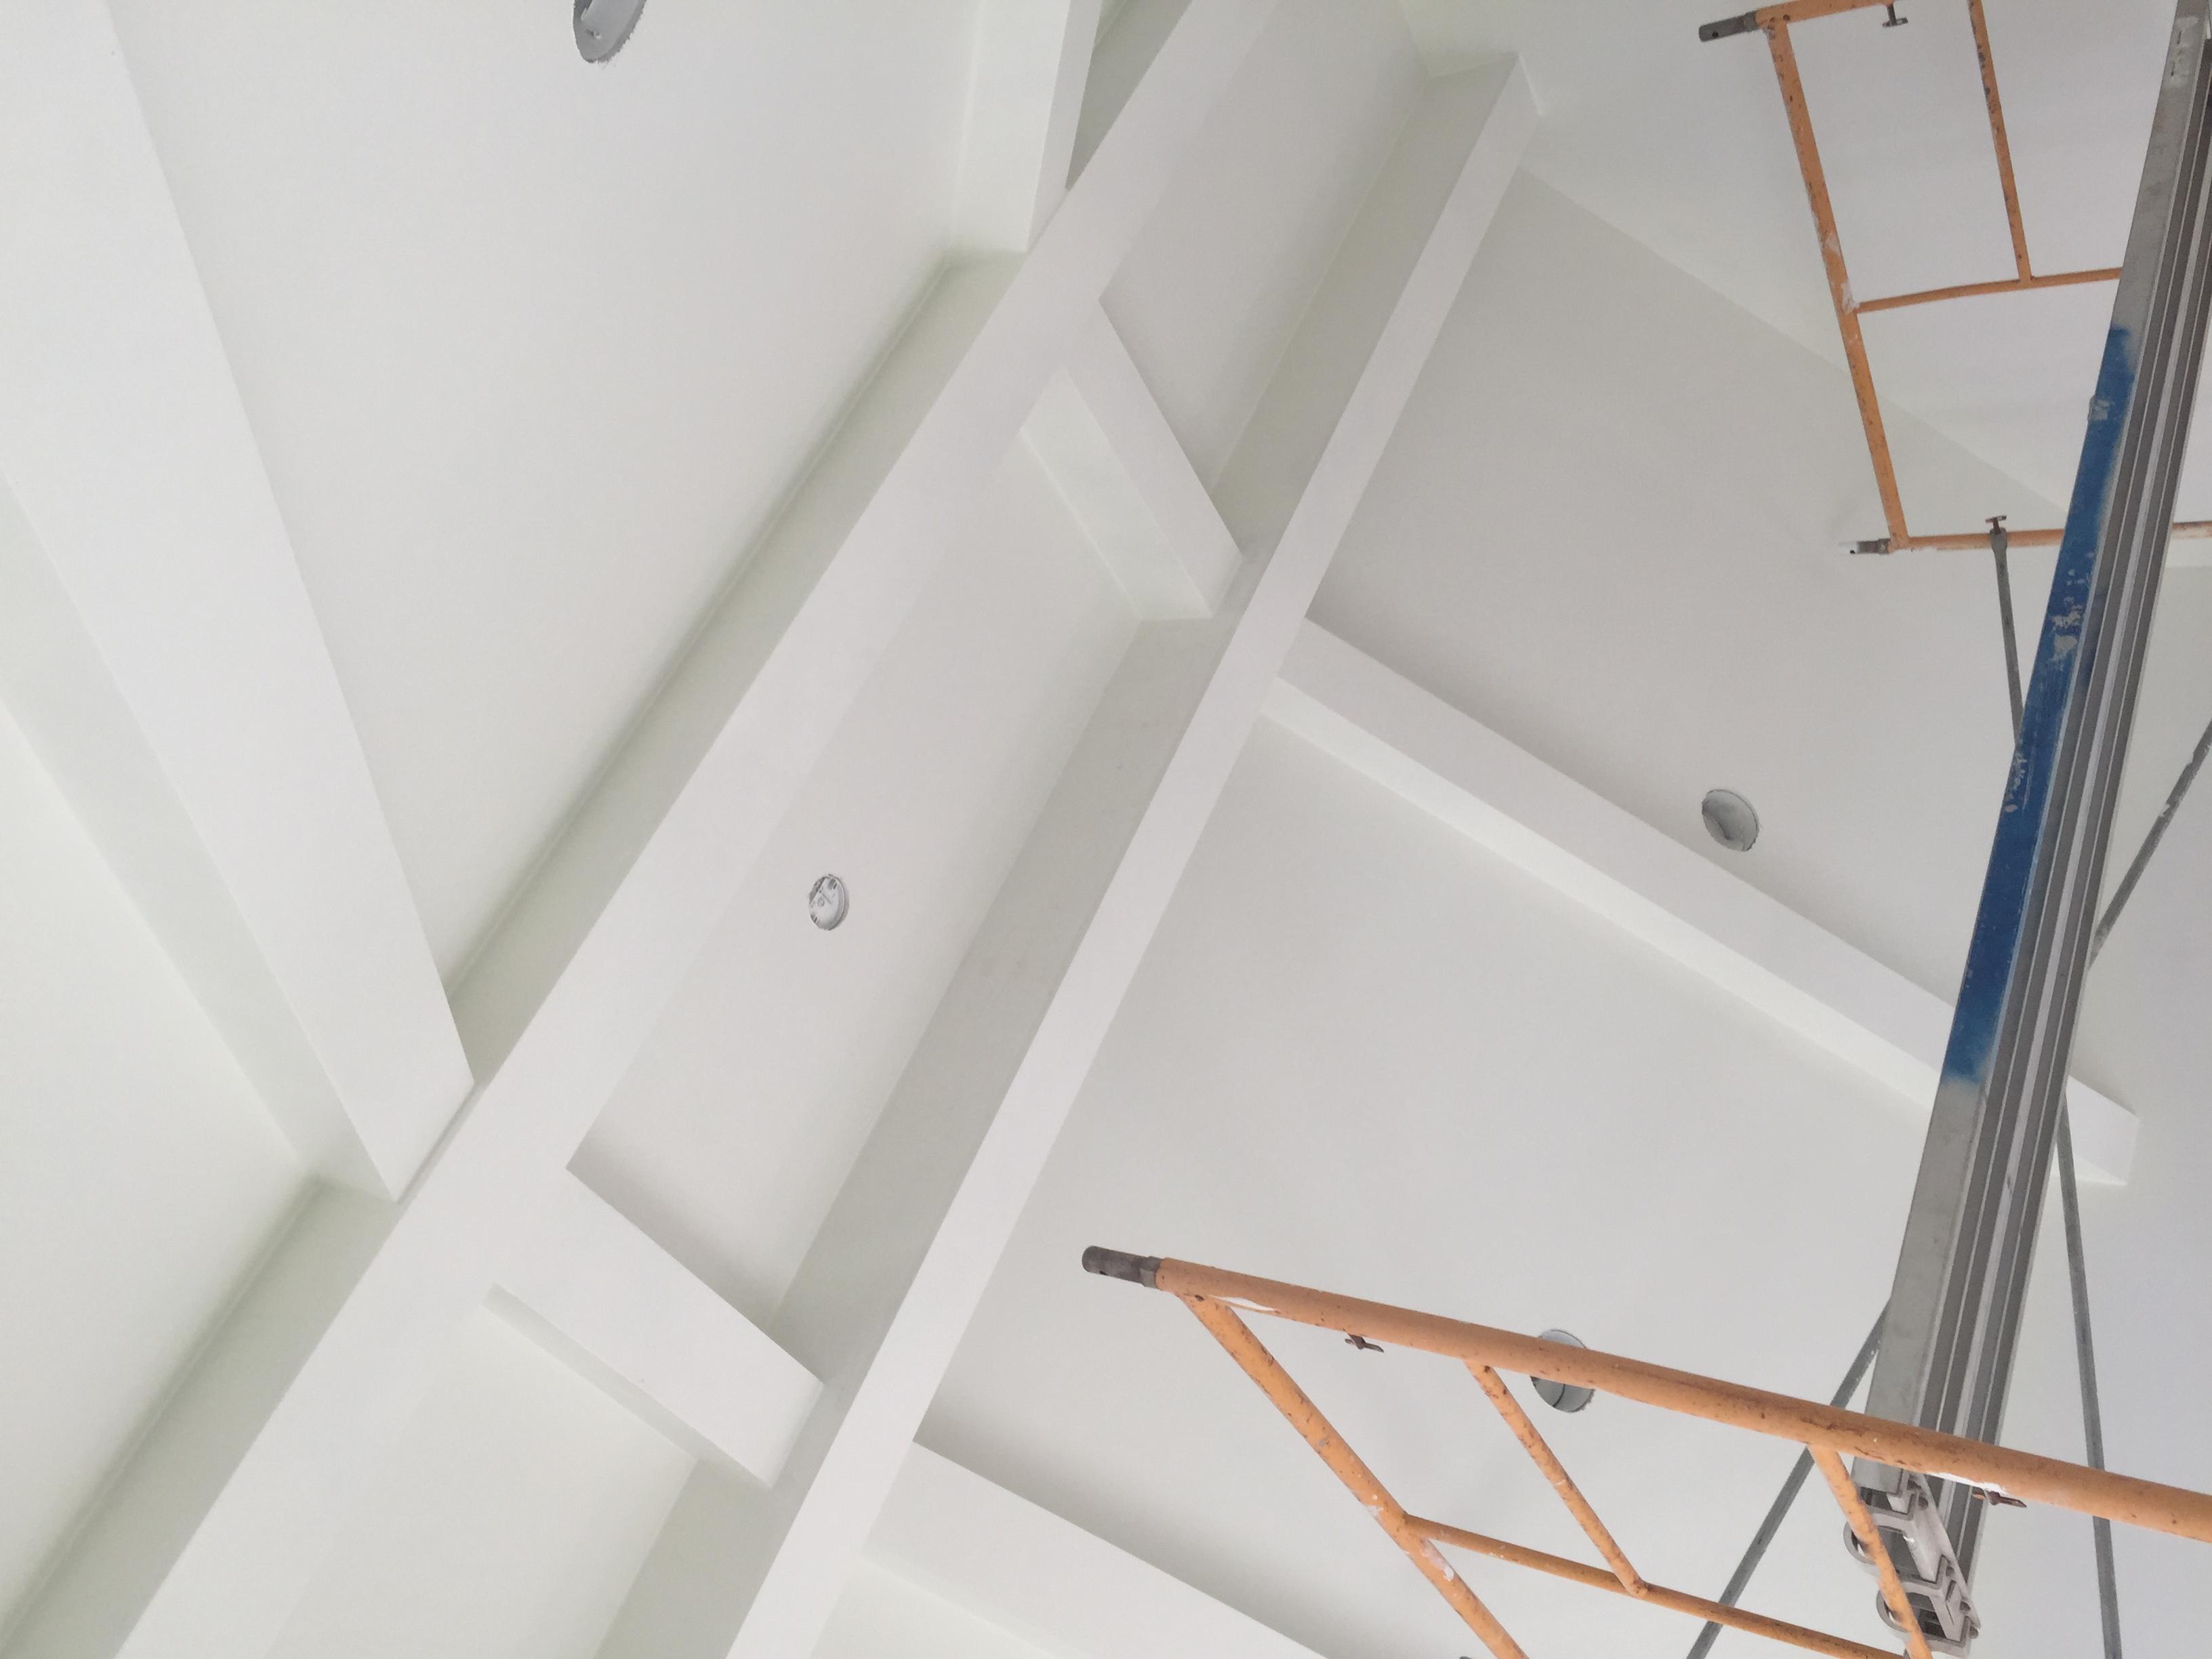 Box beams-ce481ad0-ff91-4eca-a701-f286e4a87255_1518052319321.jpeg